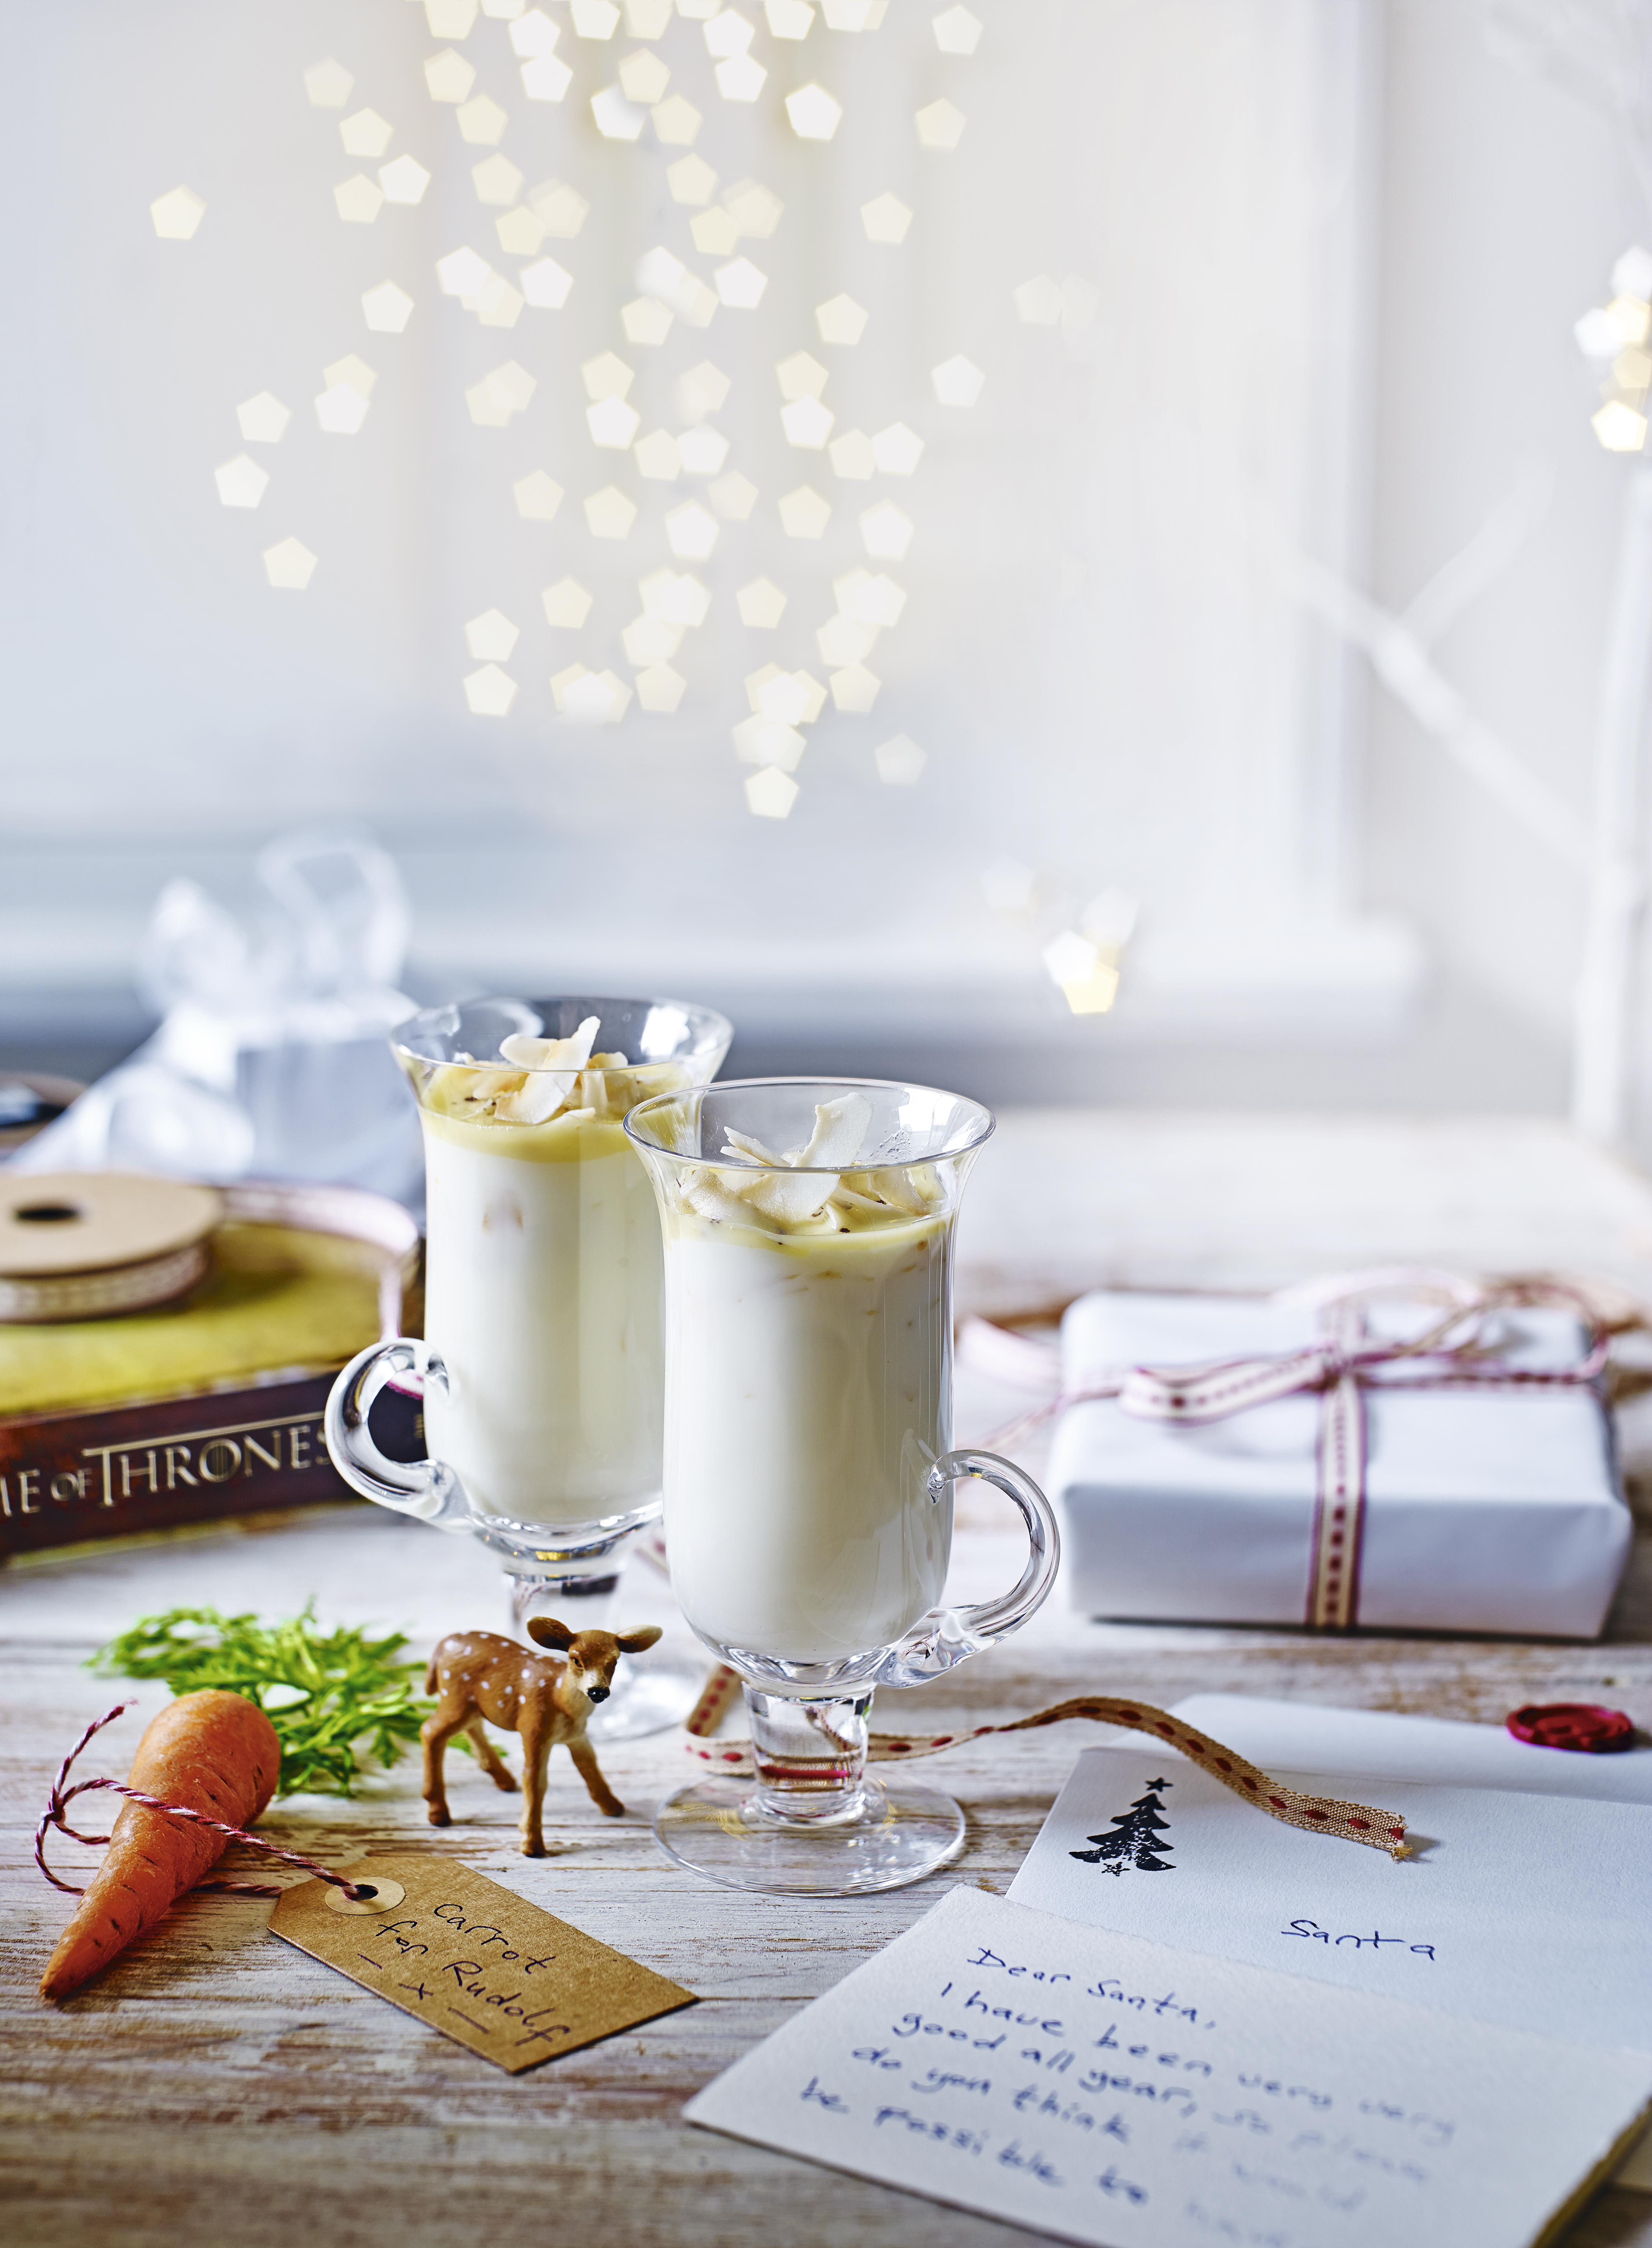 White Chocolate Toddy